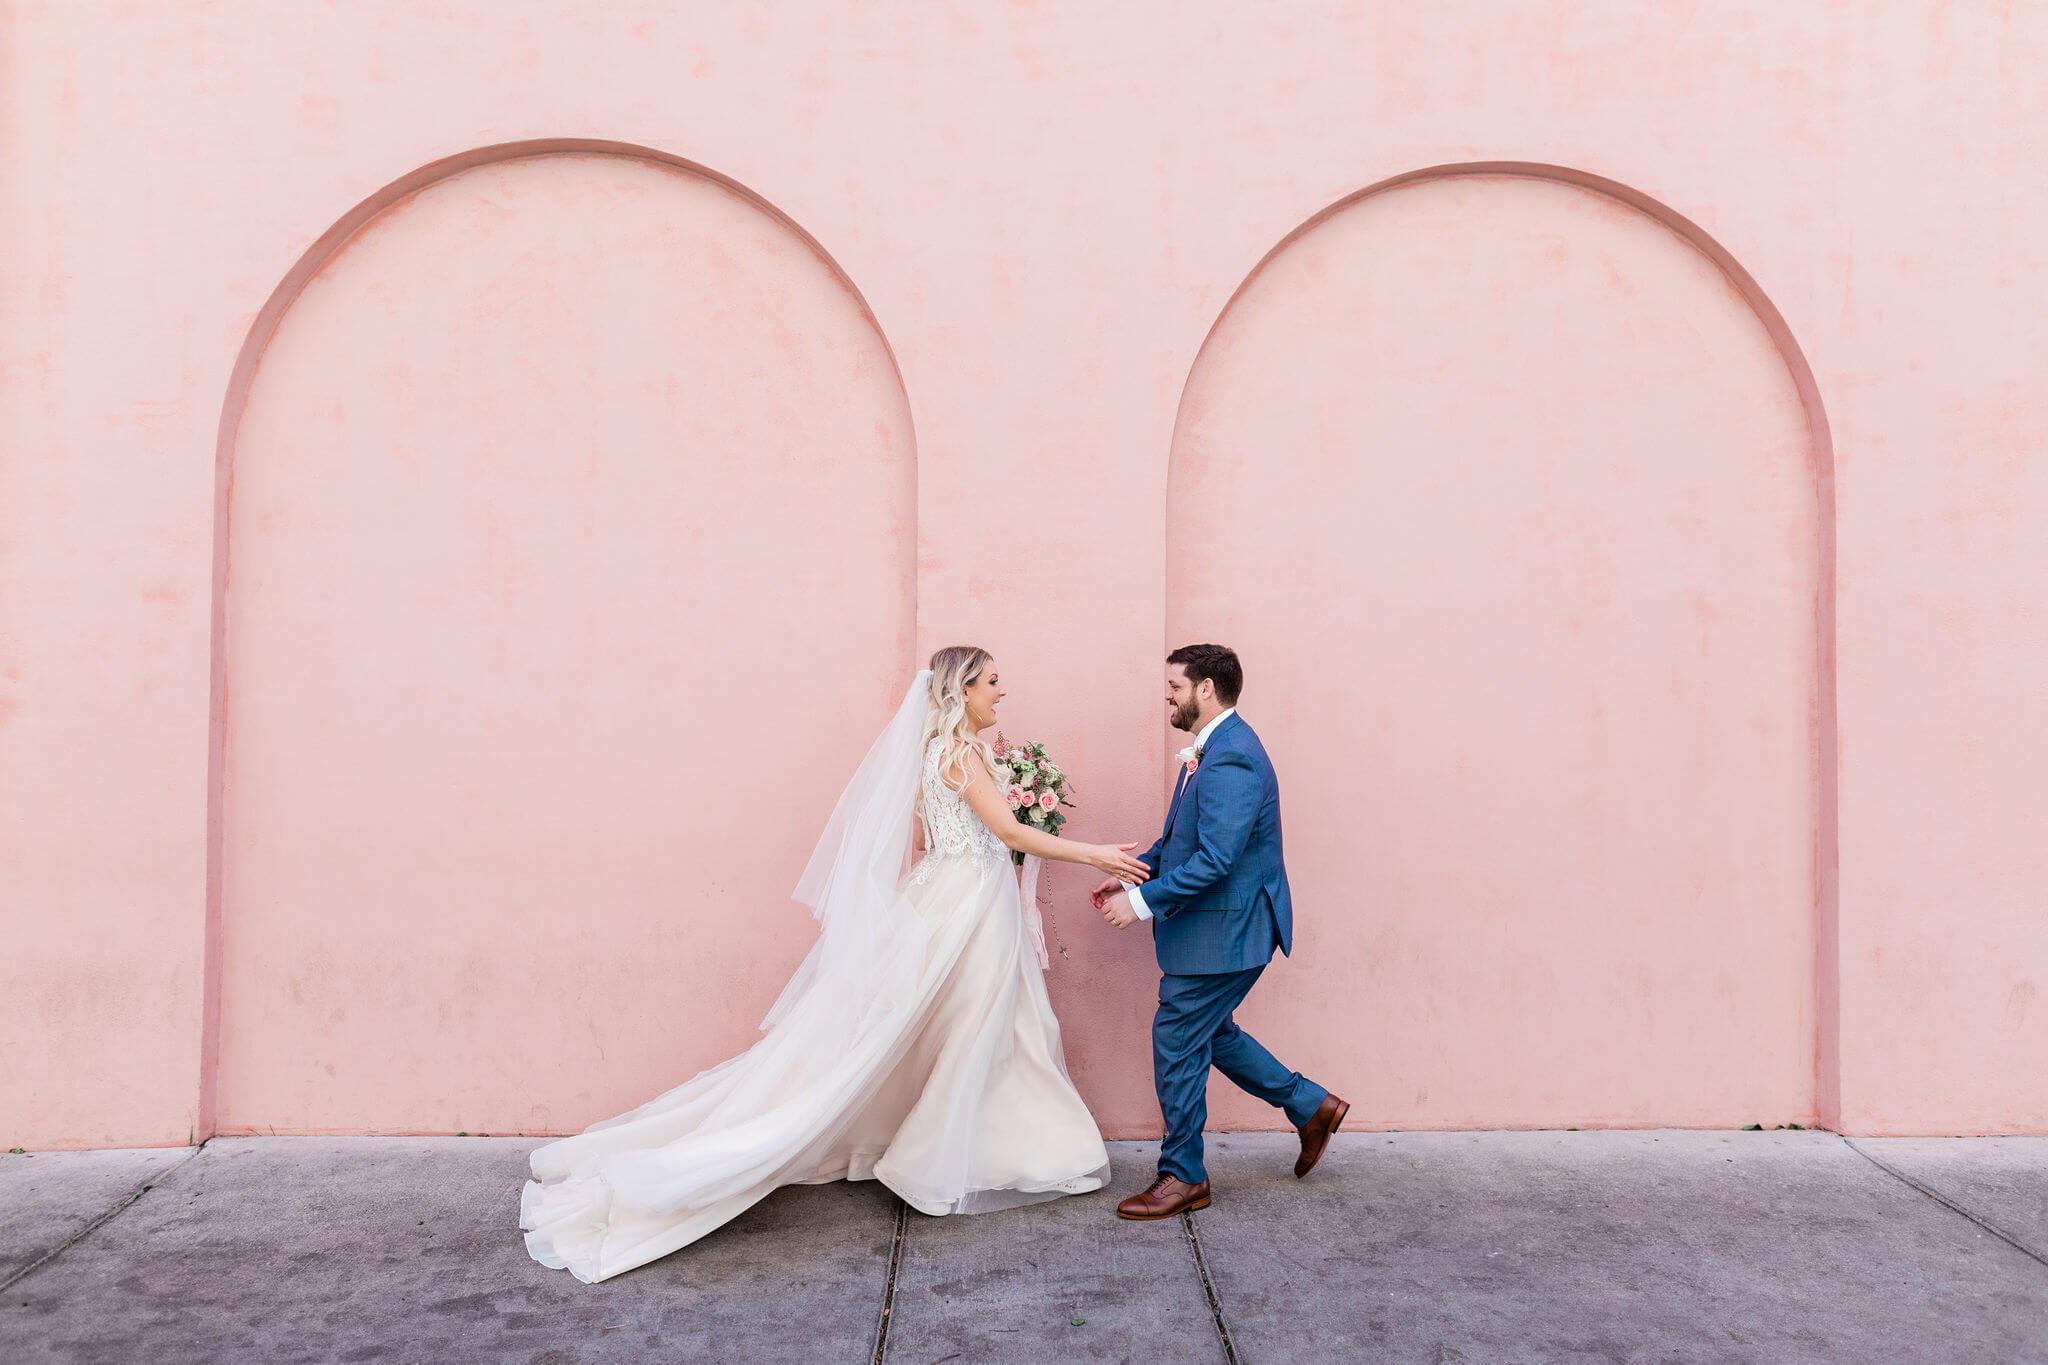 apt-b-photography-savannah-wedding-photographer-savannah-wedding-savannah-elopement-intimate-wedding-photographer-4.jpg